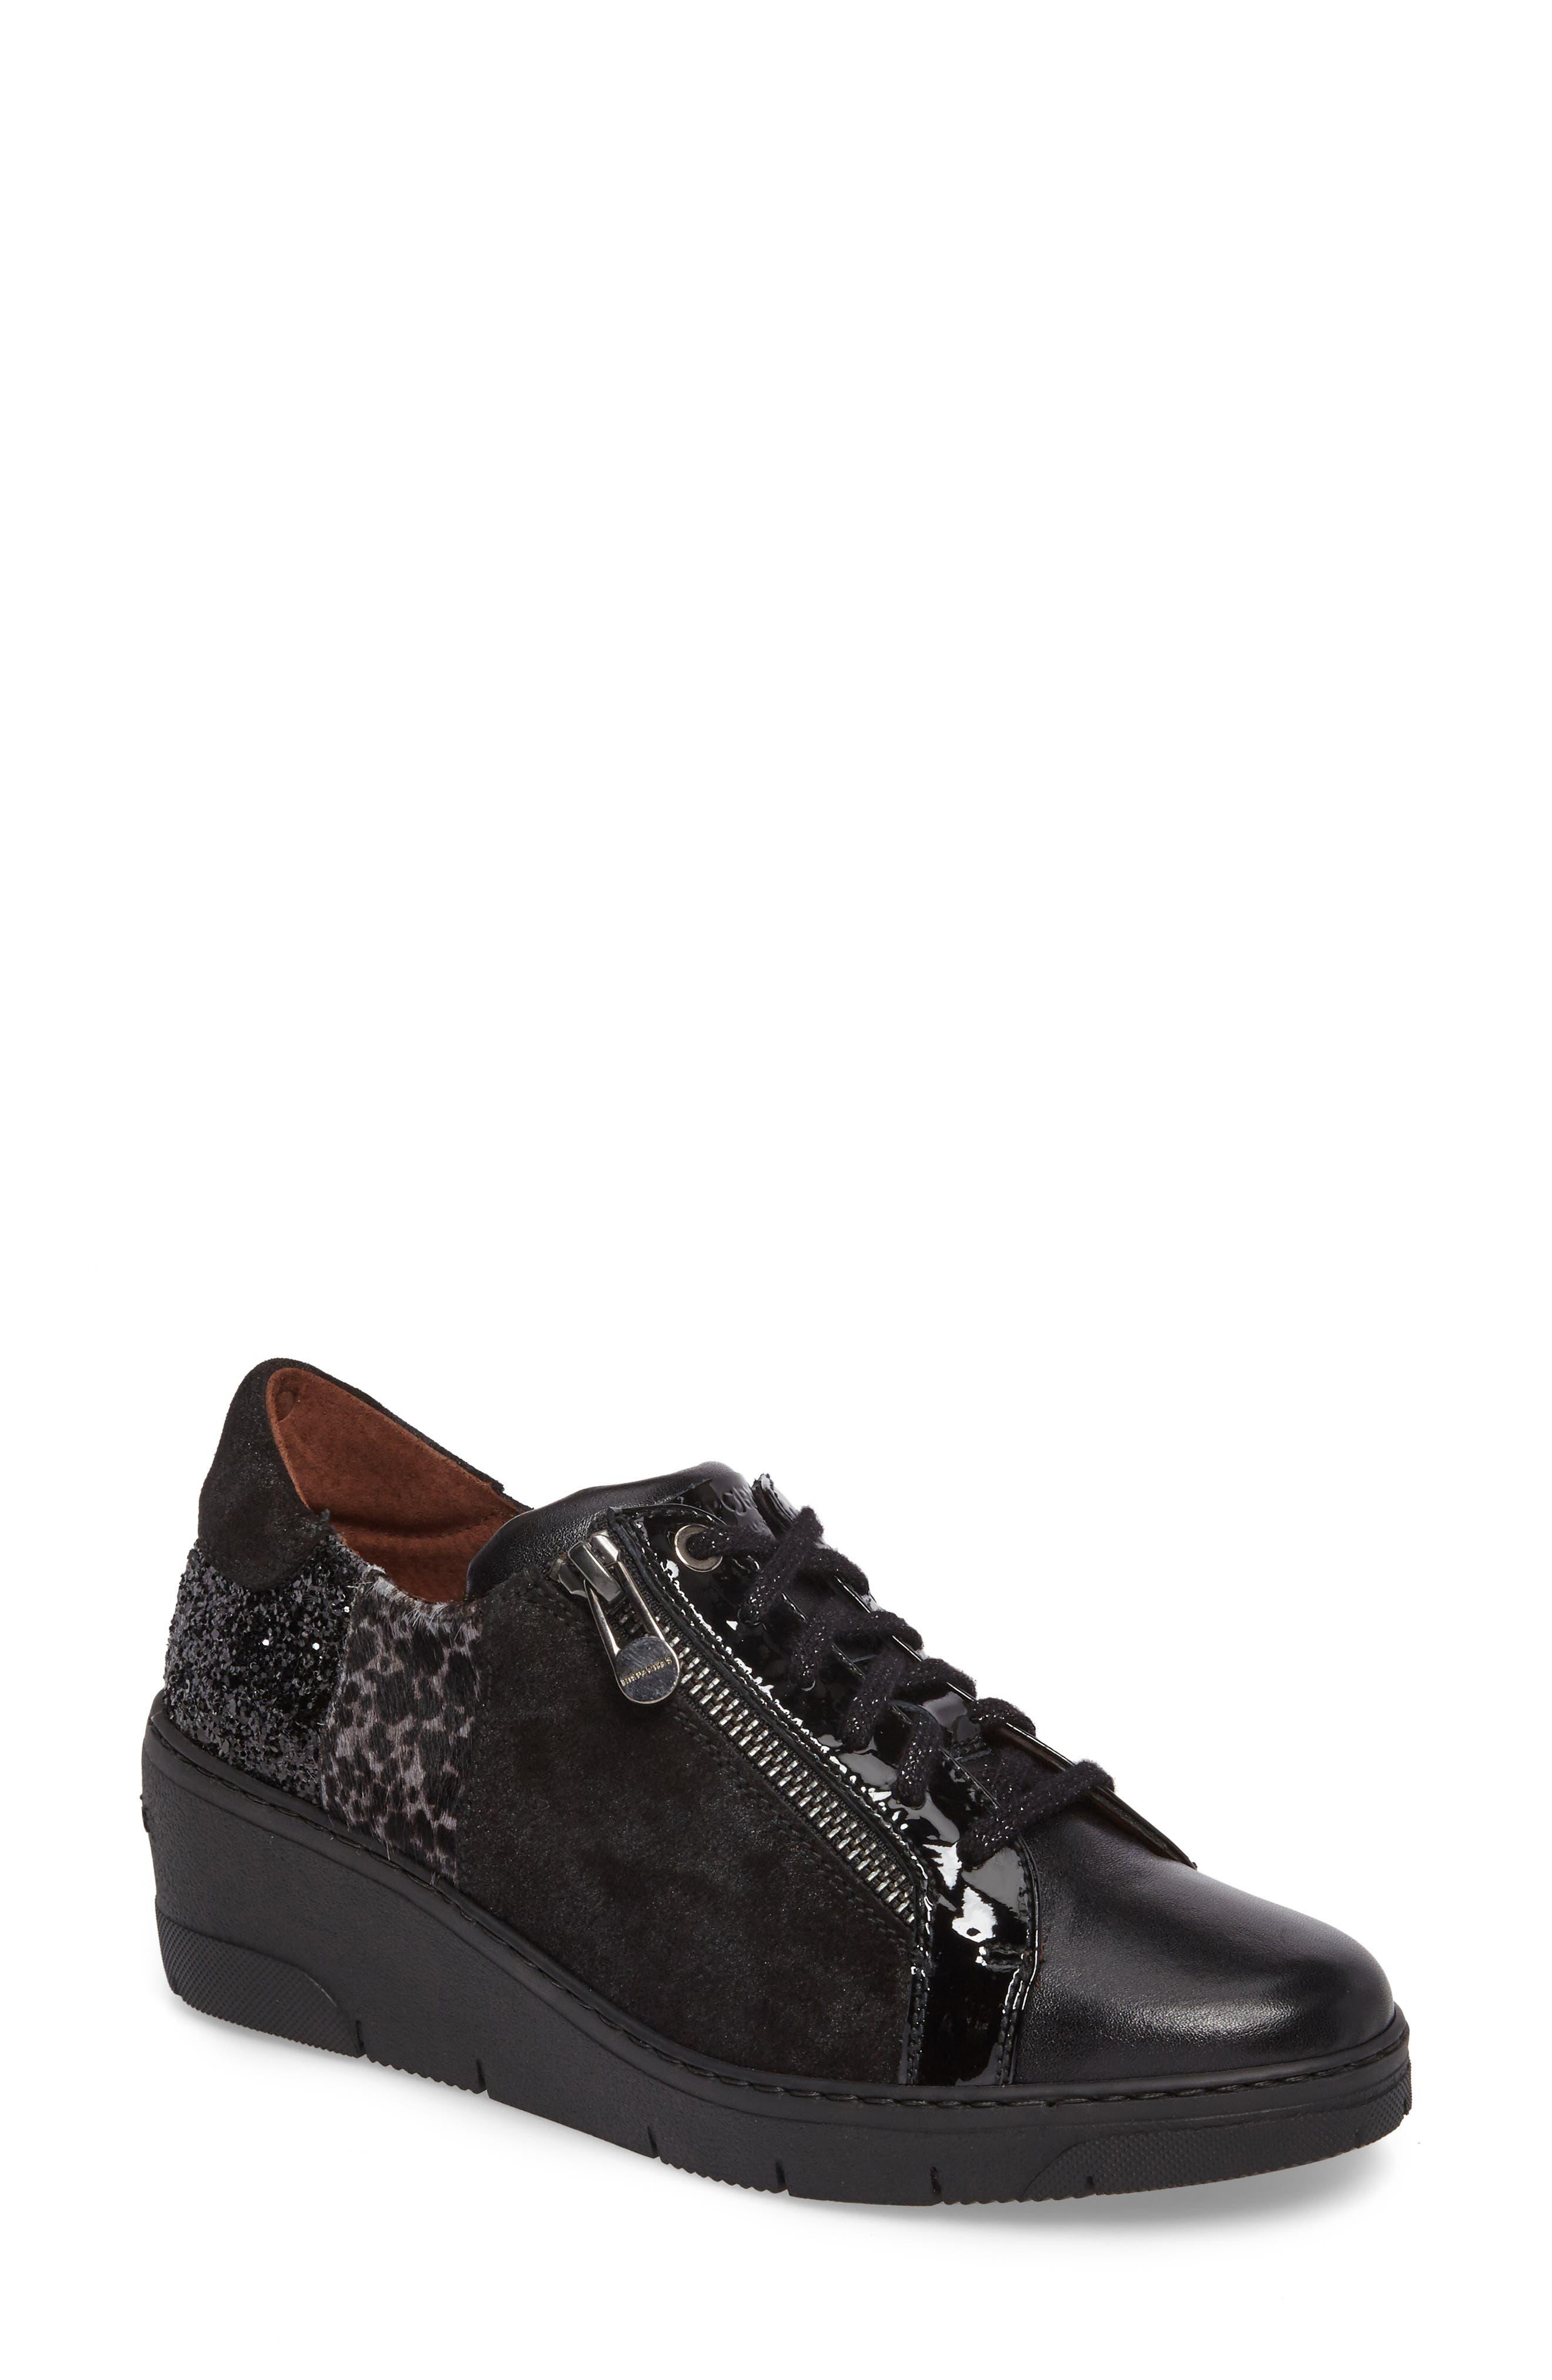 Sammi Sneaker,                             Main thumbnail 1, color,                             001